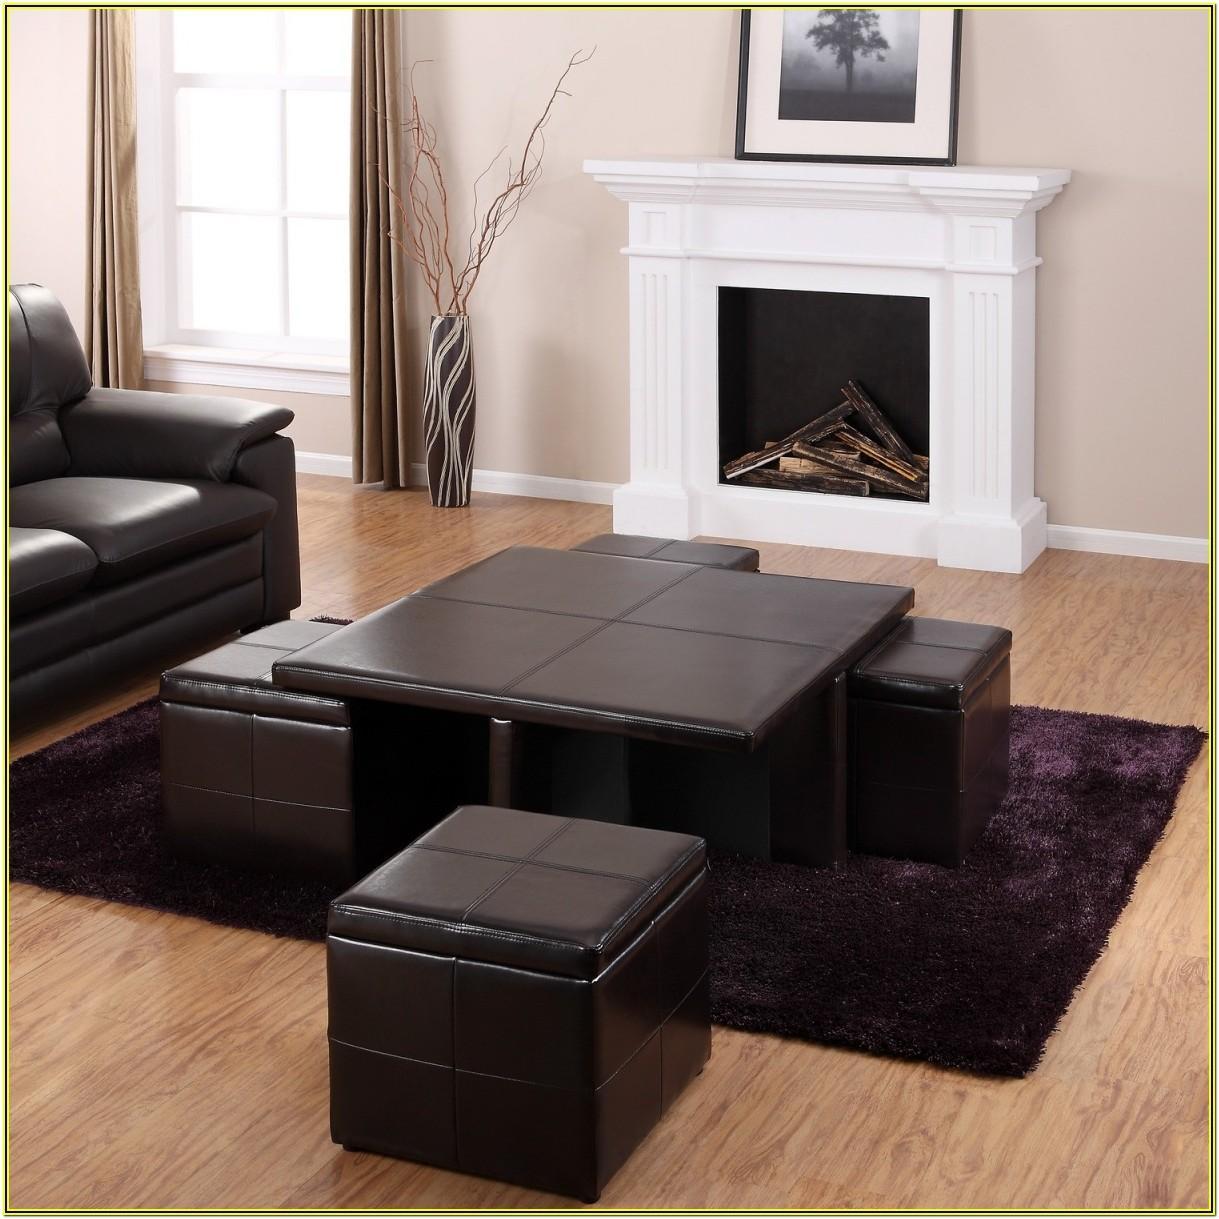 Living Room Leather Ottoman Ideas